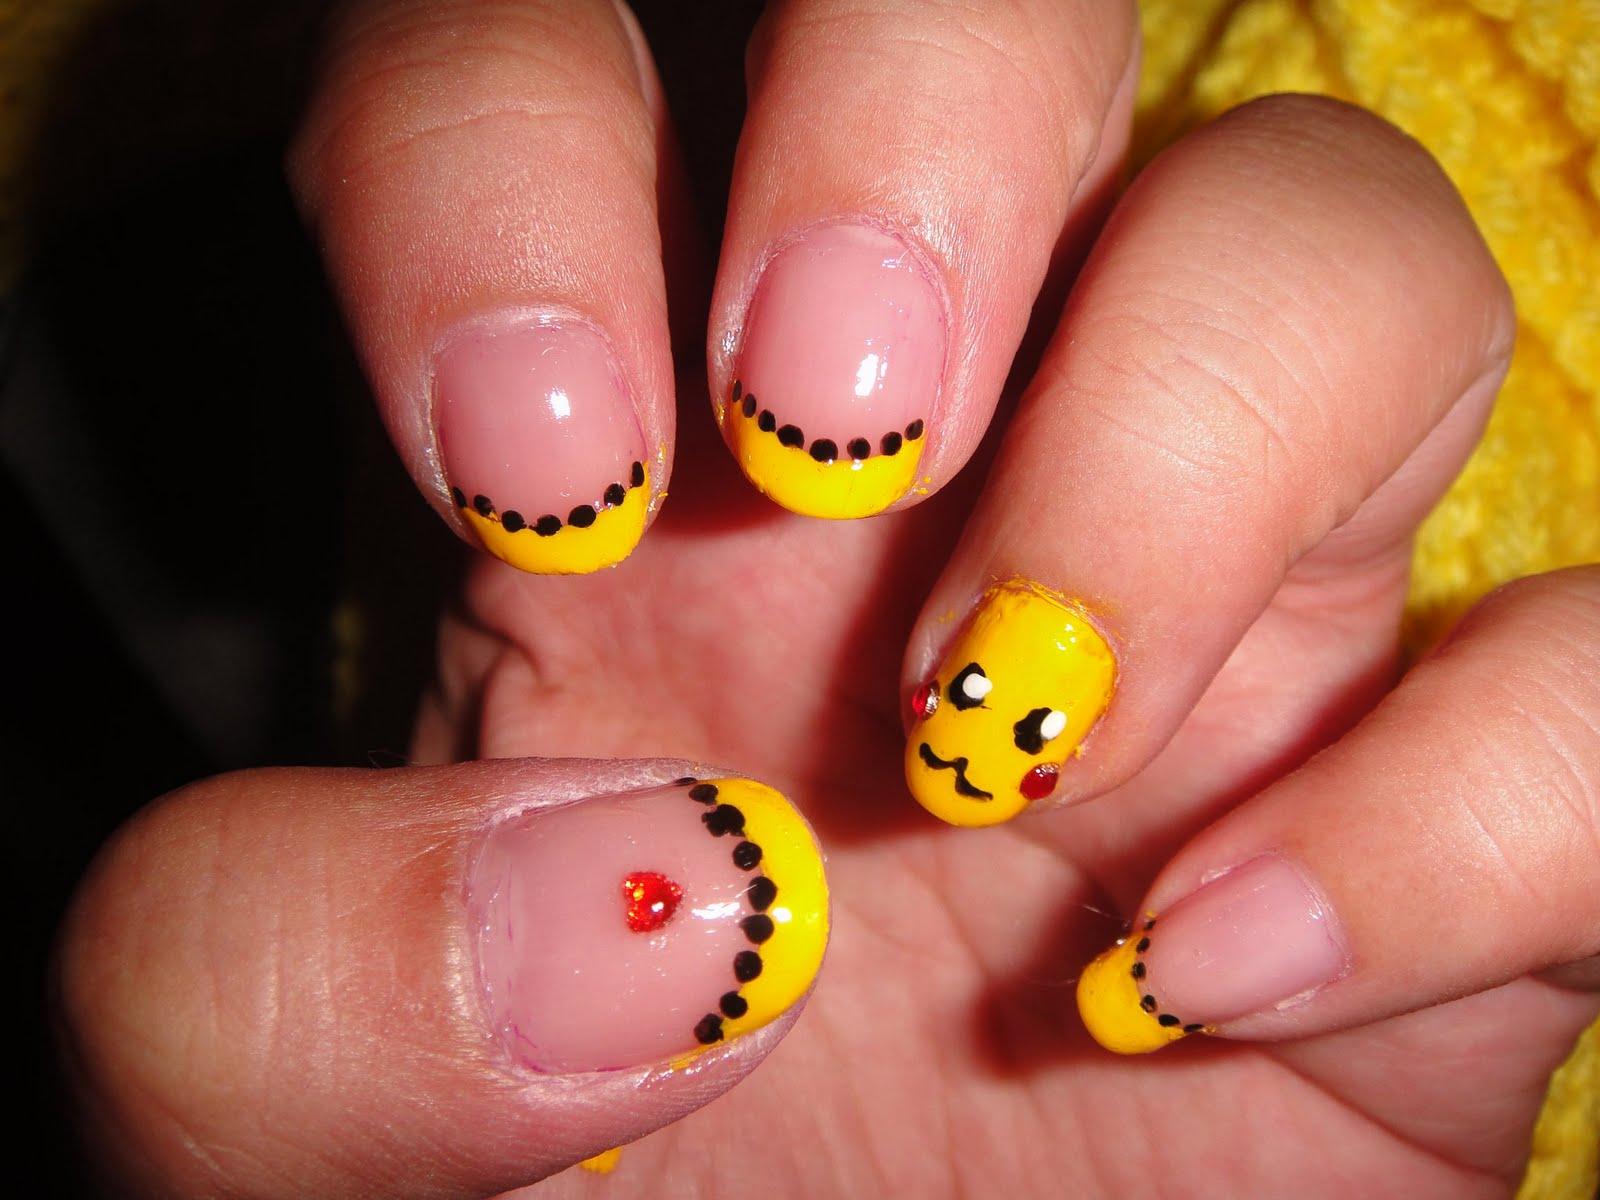 Juicy Nails & Makeup!: Pikachu Nails @ Anime Expo